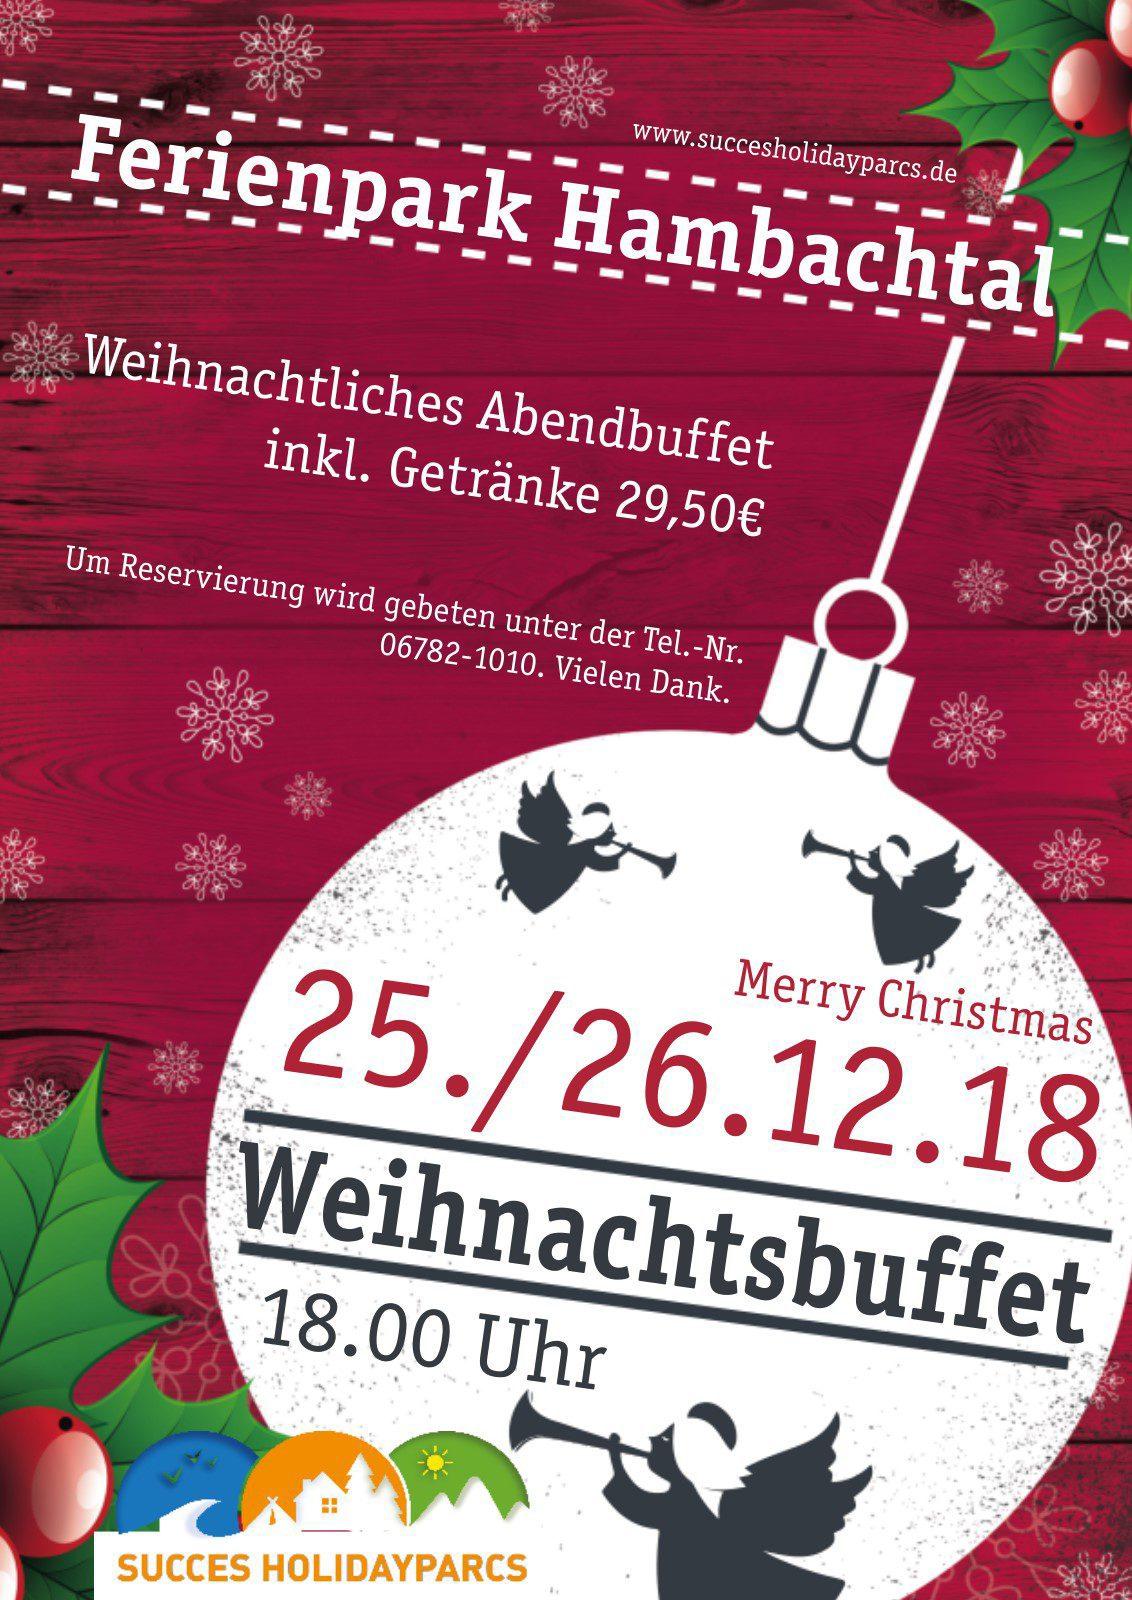 Weihnachtsbuffet Hambachtal